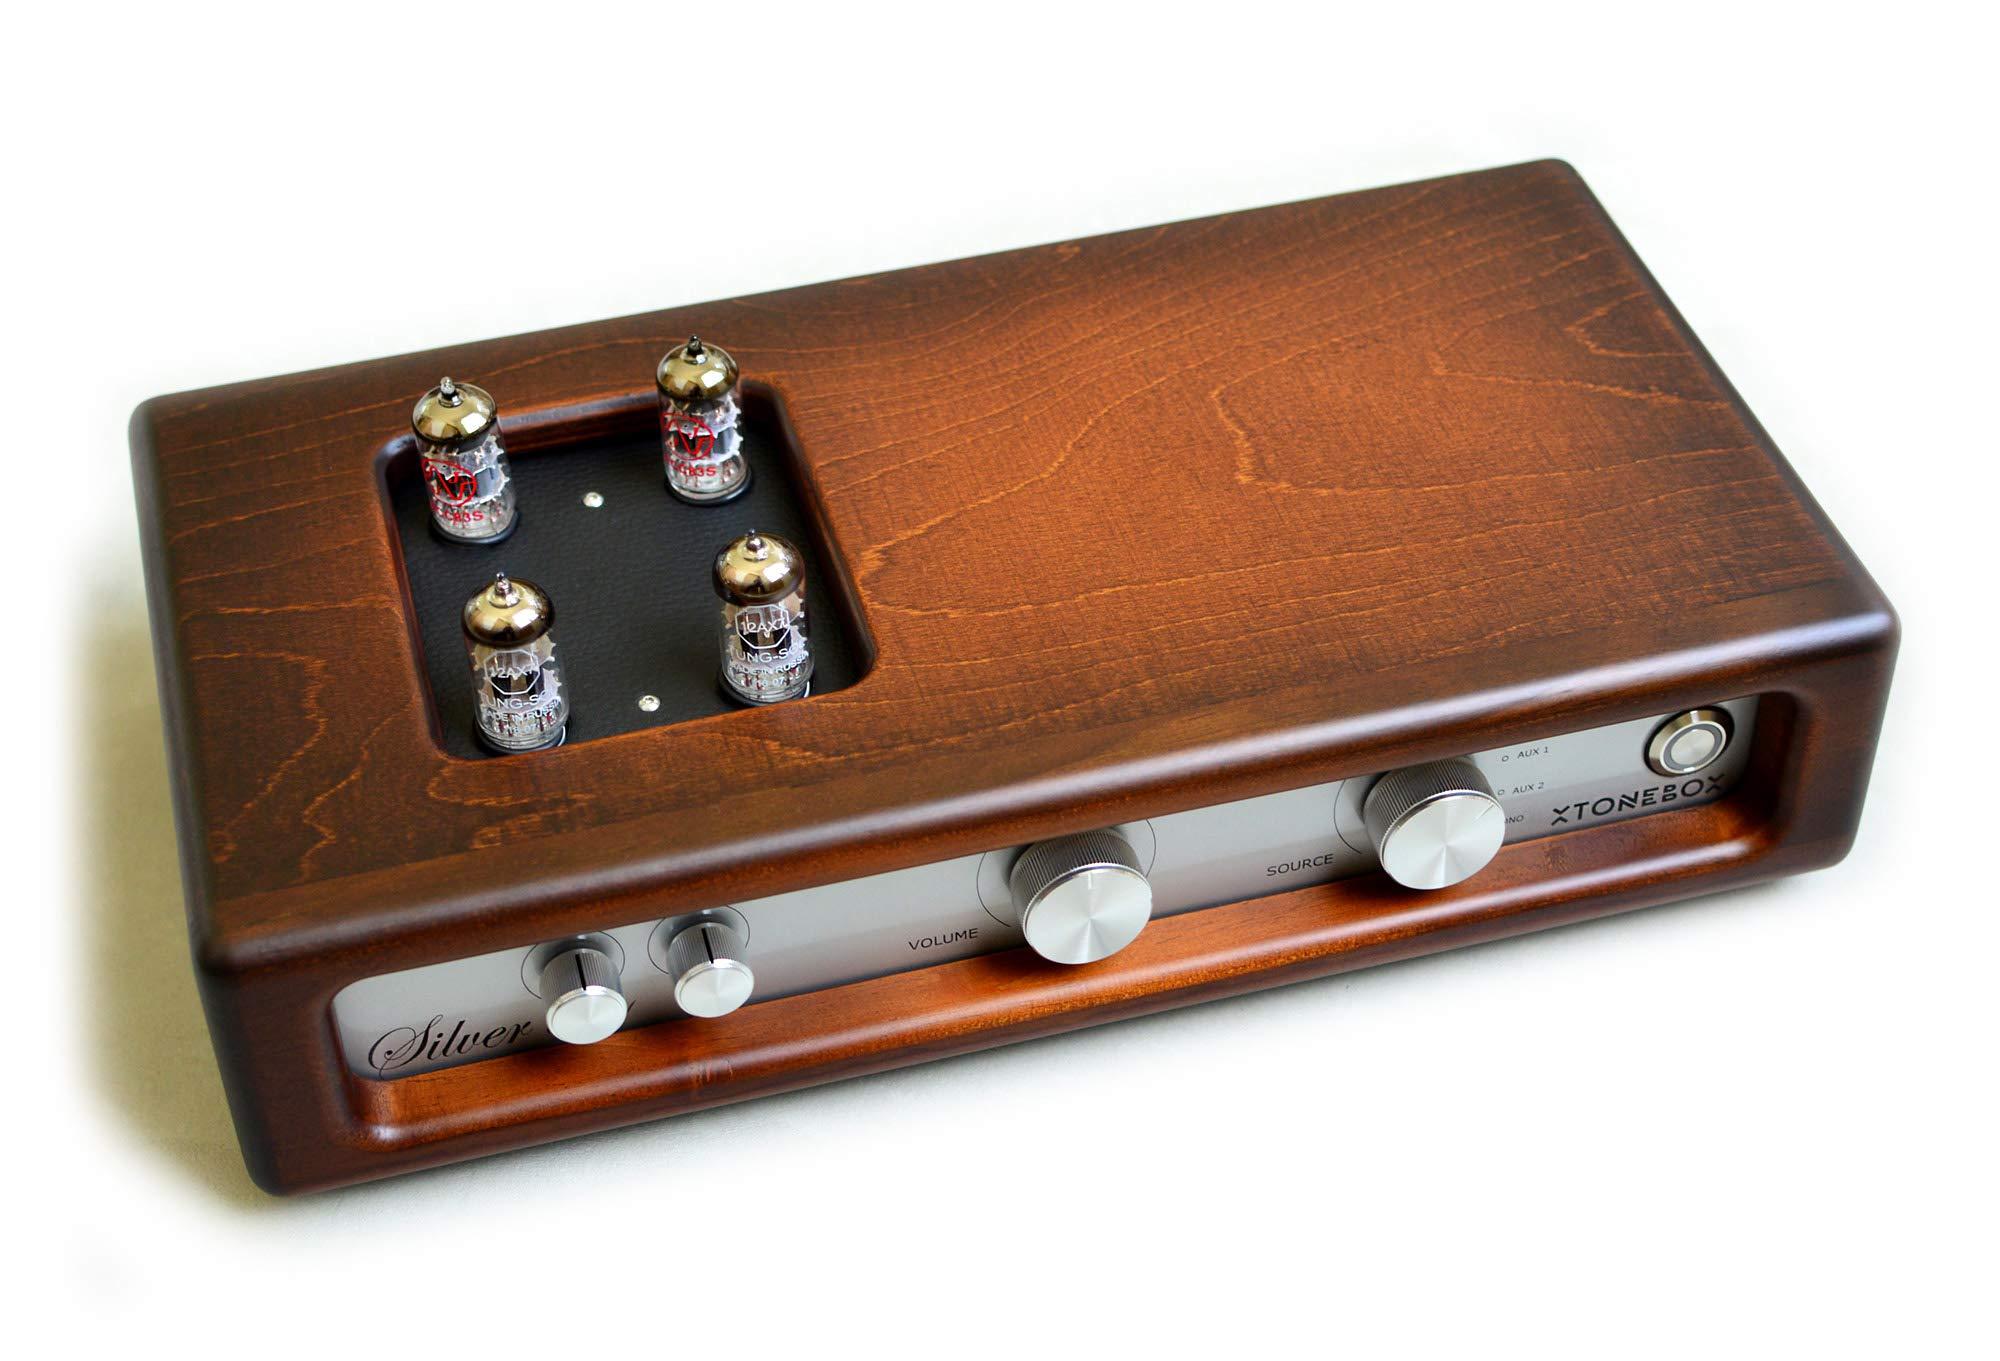 Xtonebox Silver 6011 Amplificador estéreo música a válvulas para ...